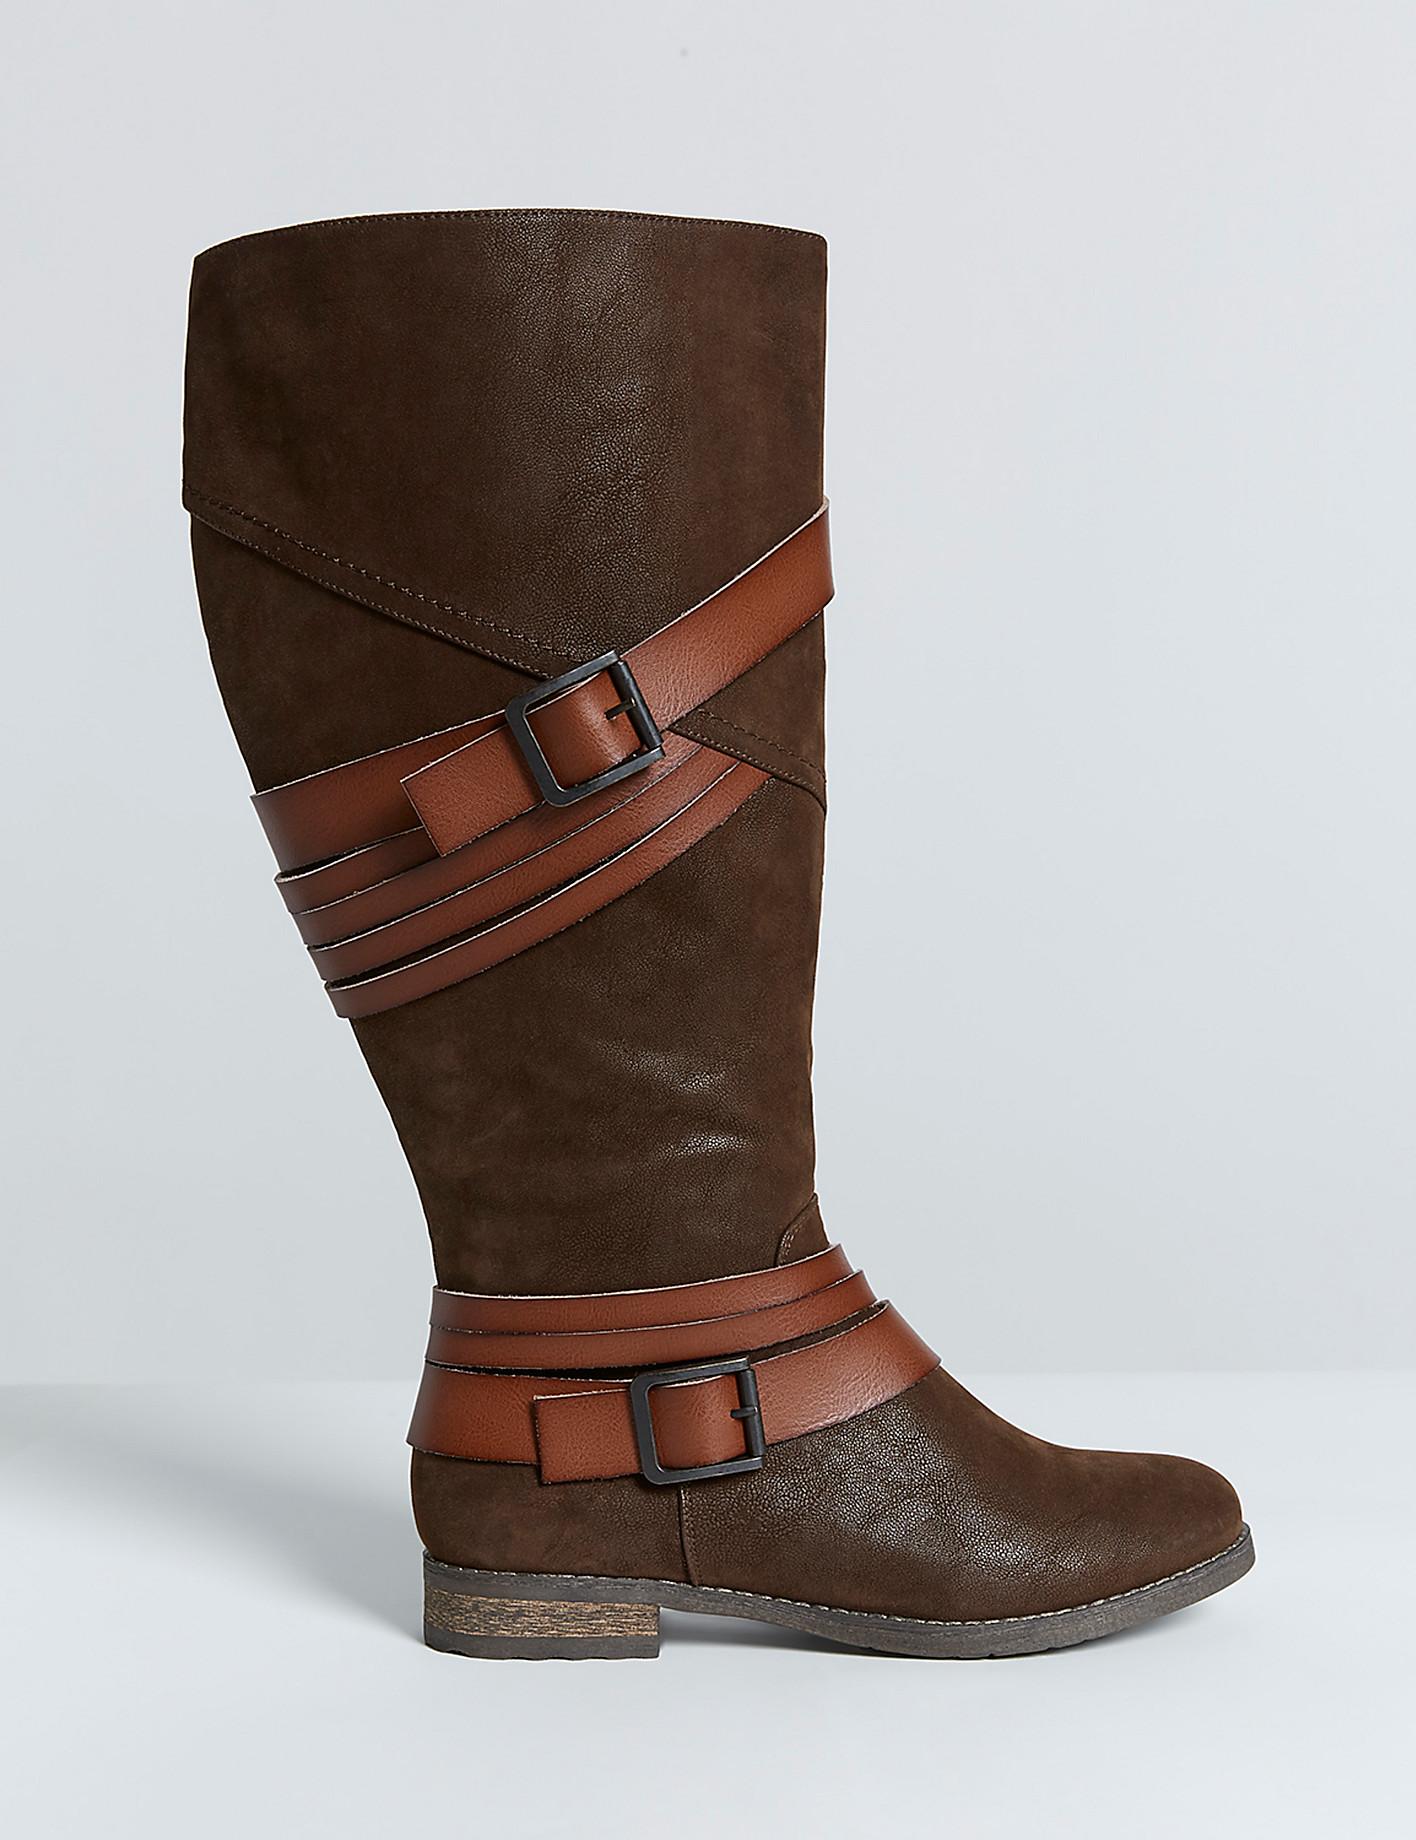 Winkelen voor breed kalf en breed breedte laarzen op Lane Bryant val laarzen